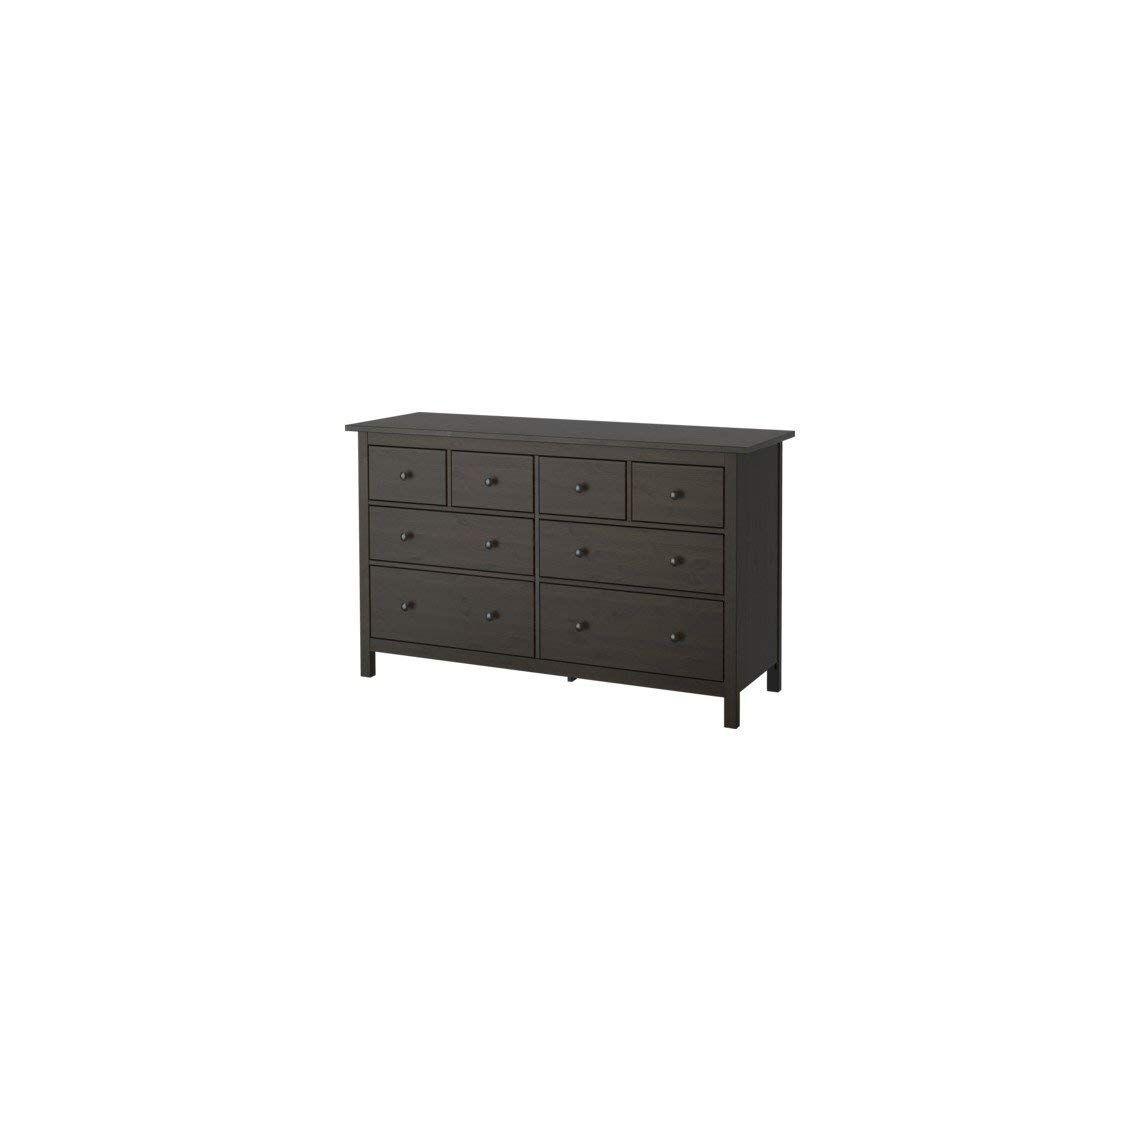 Ikea 8 Drawer Dresser Black Brown 2028 52620 230